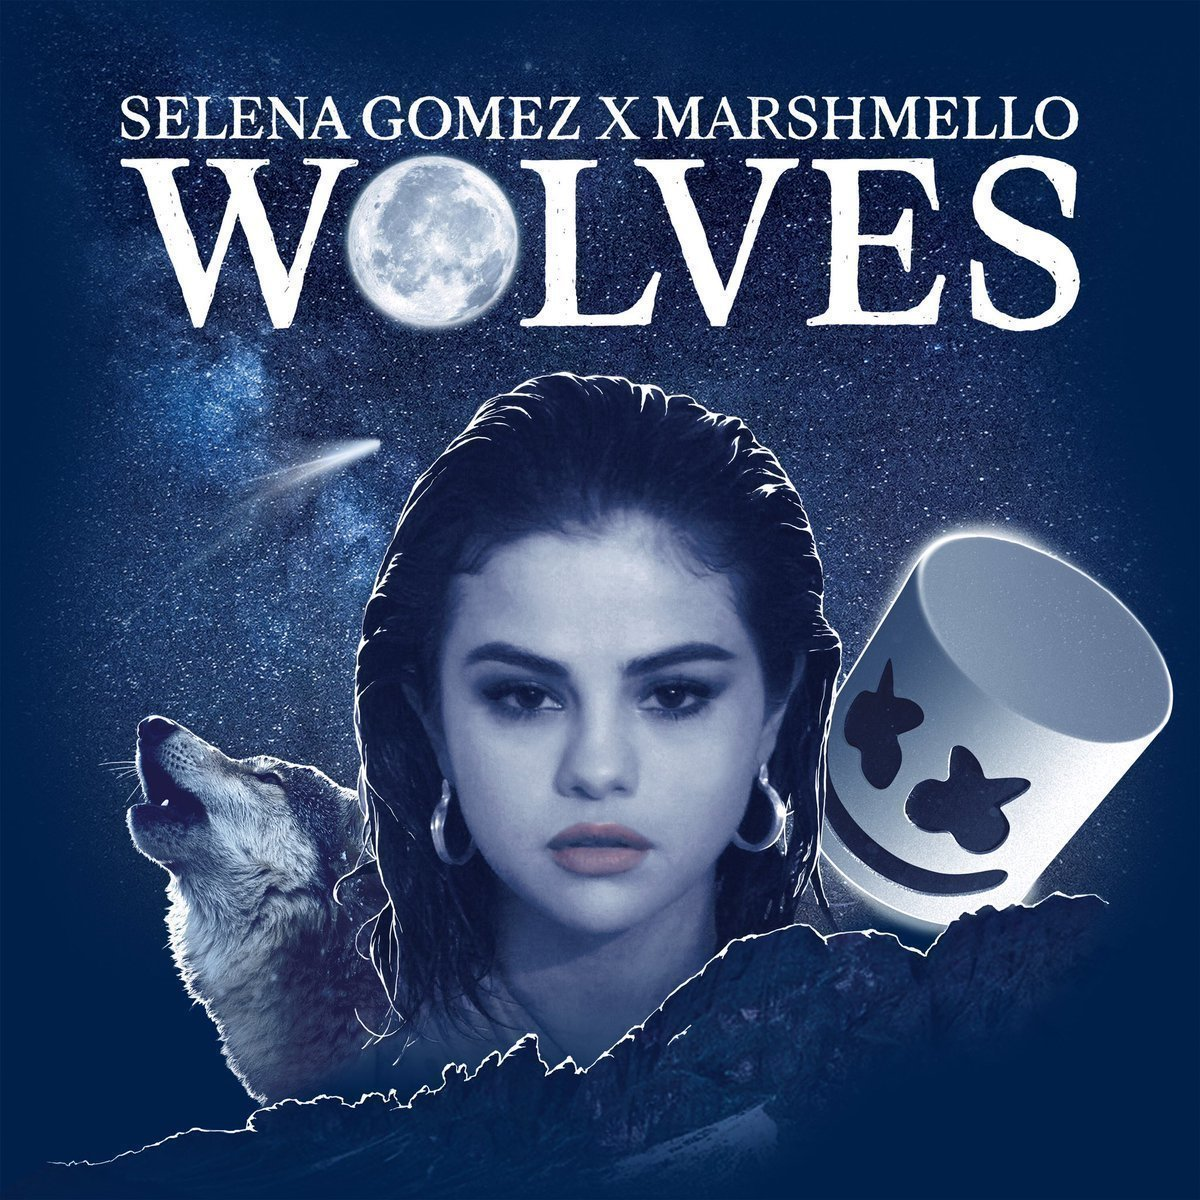 Selena gomez ft marshimello wolves